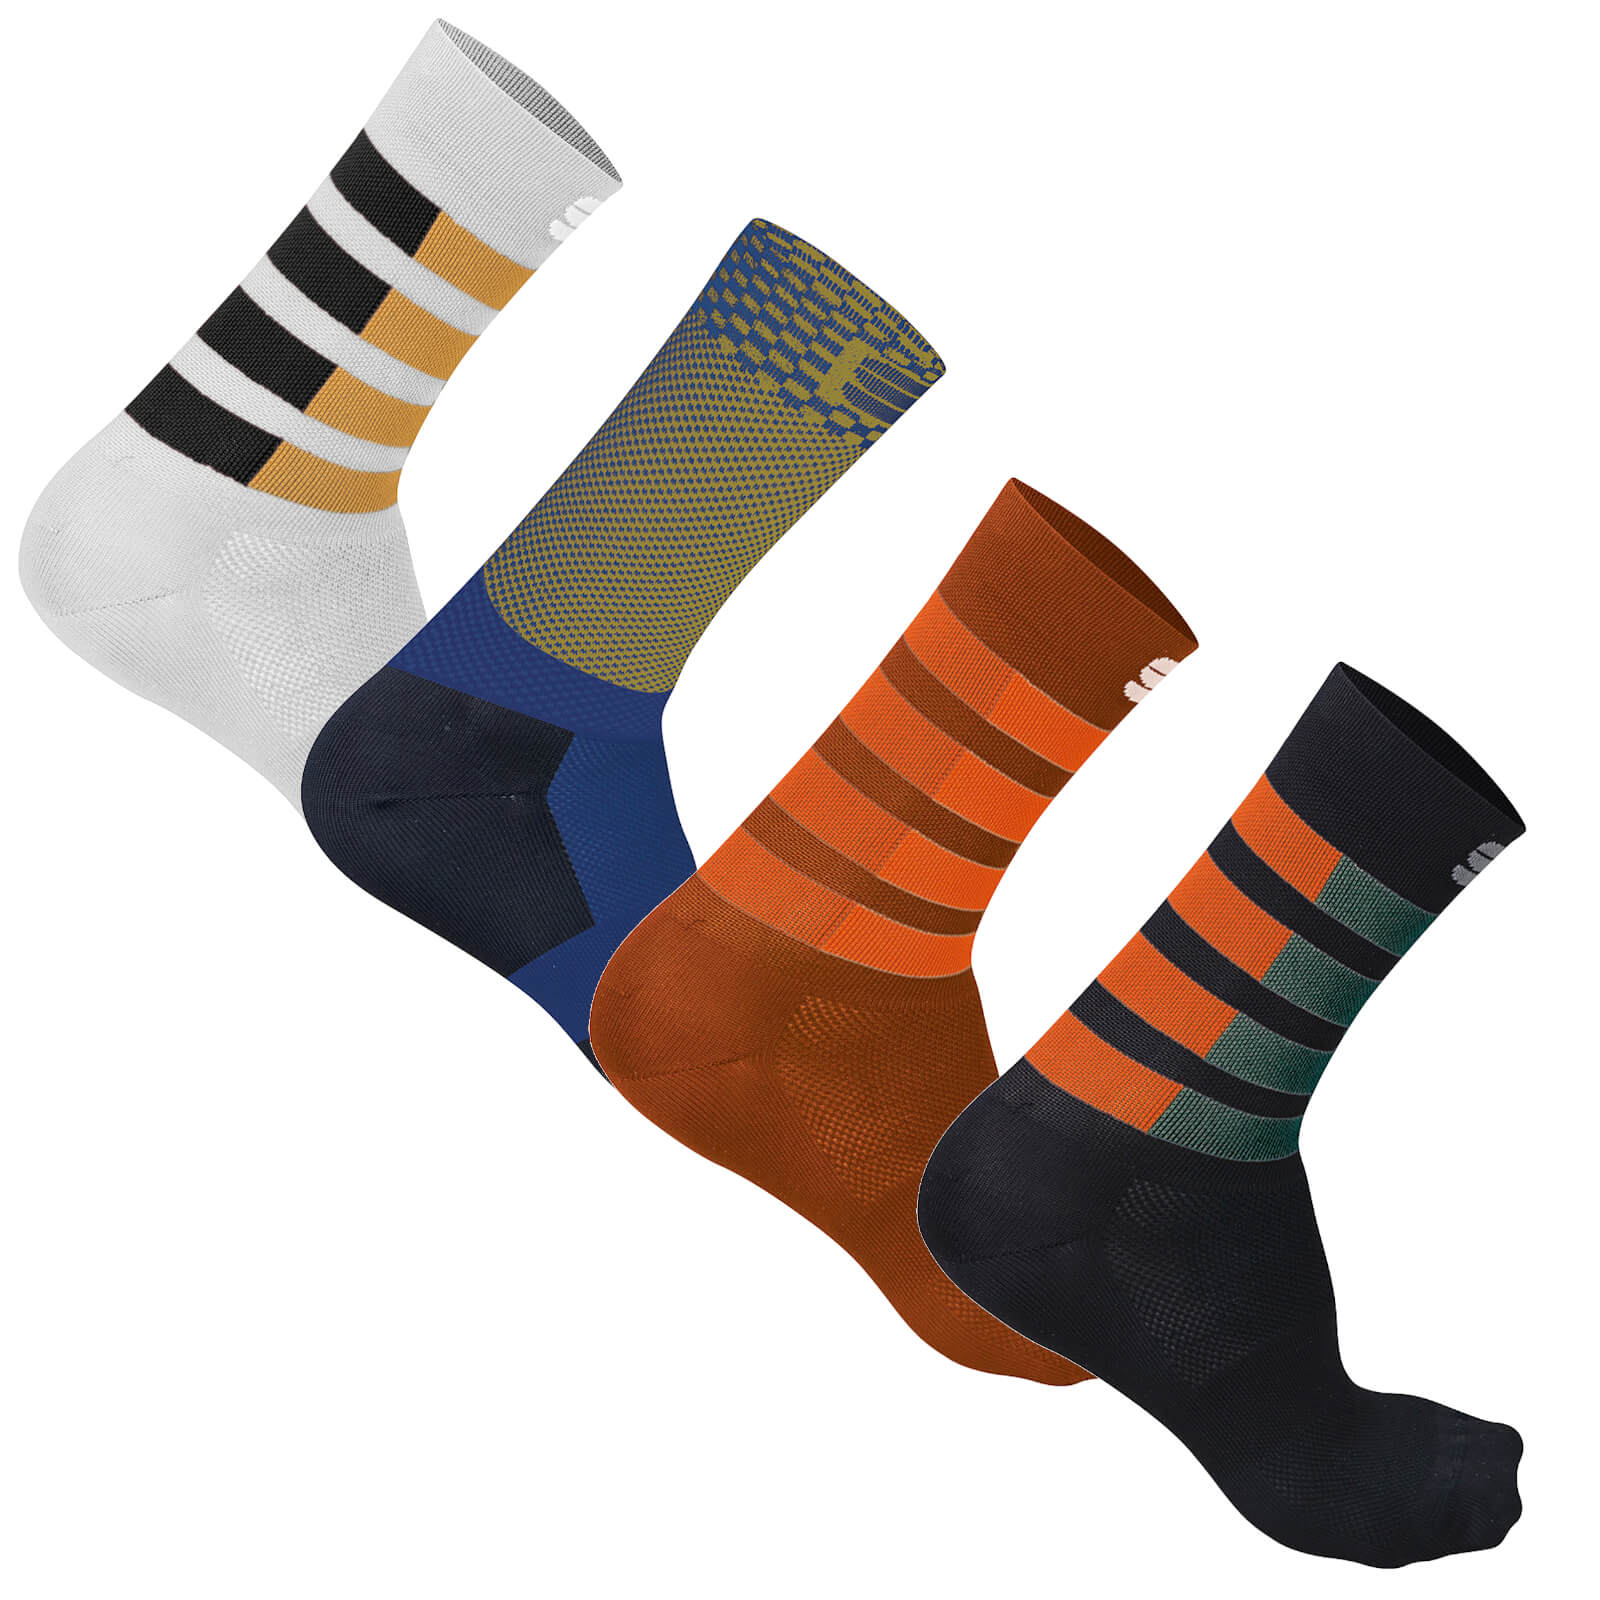 Sportful Mate Socks - XL - Black/Fire Red/Orange SDR